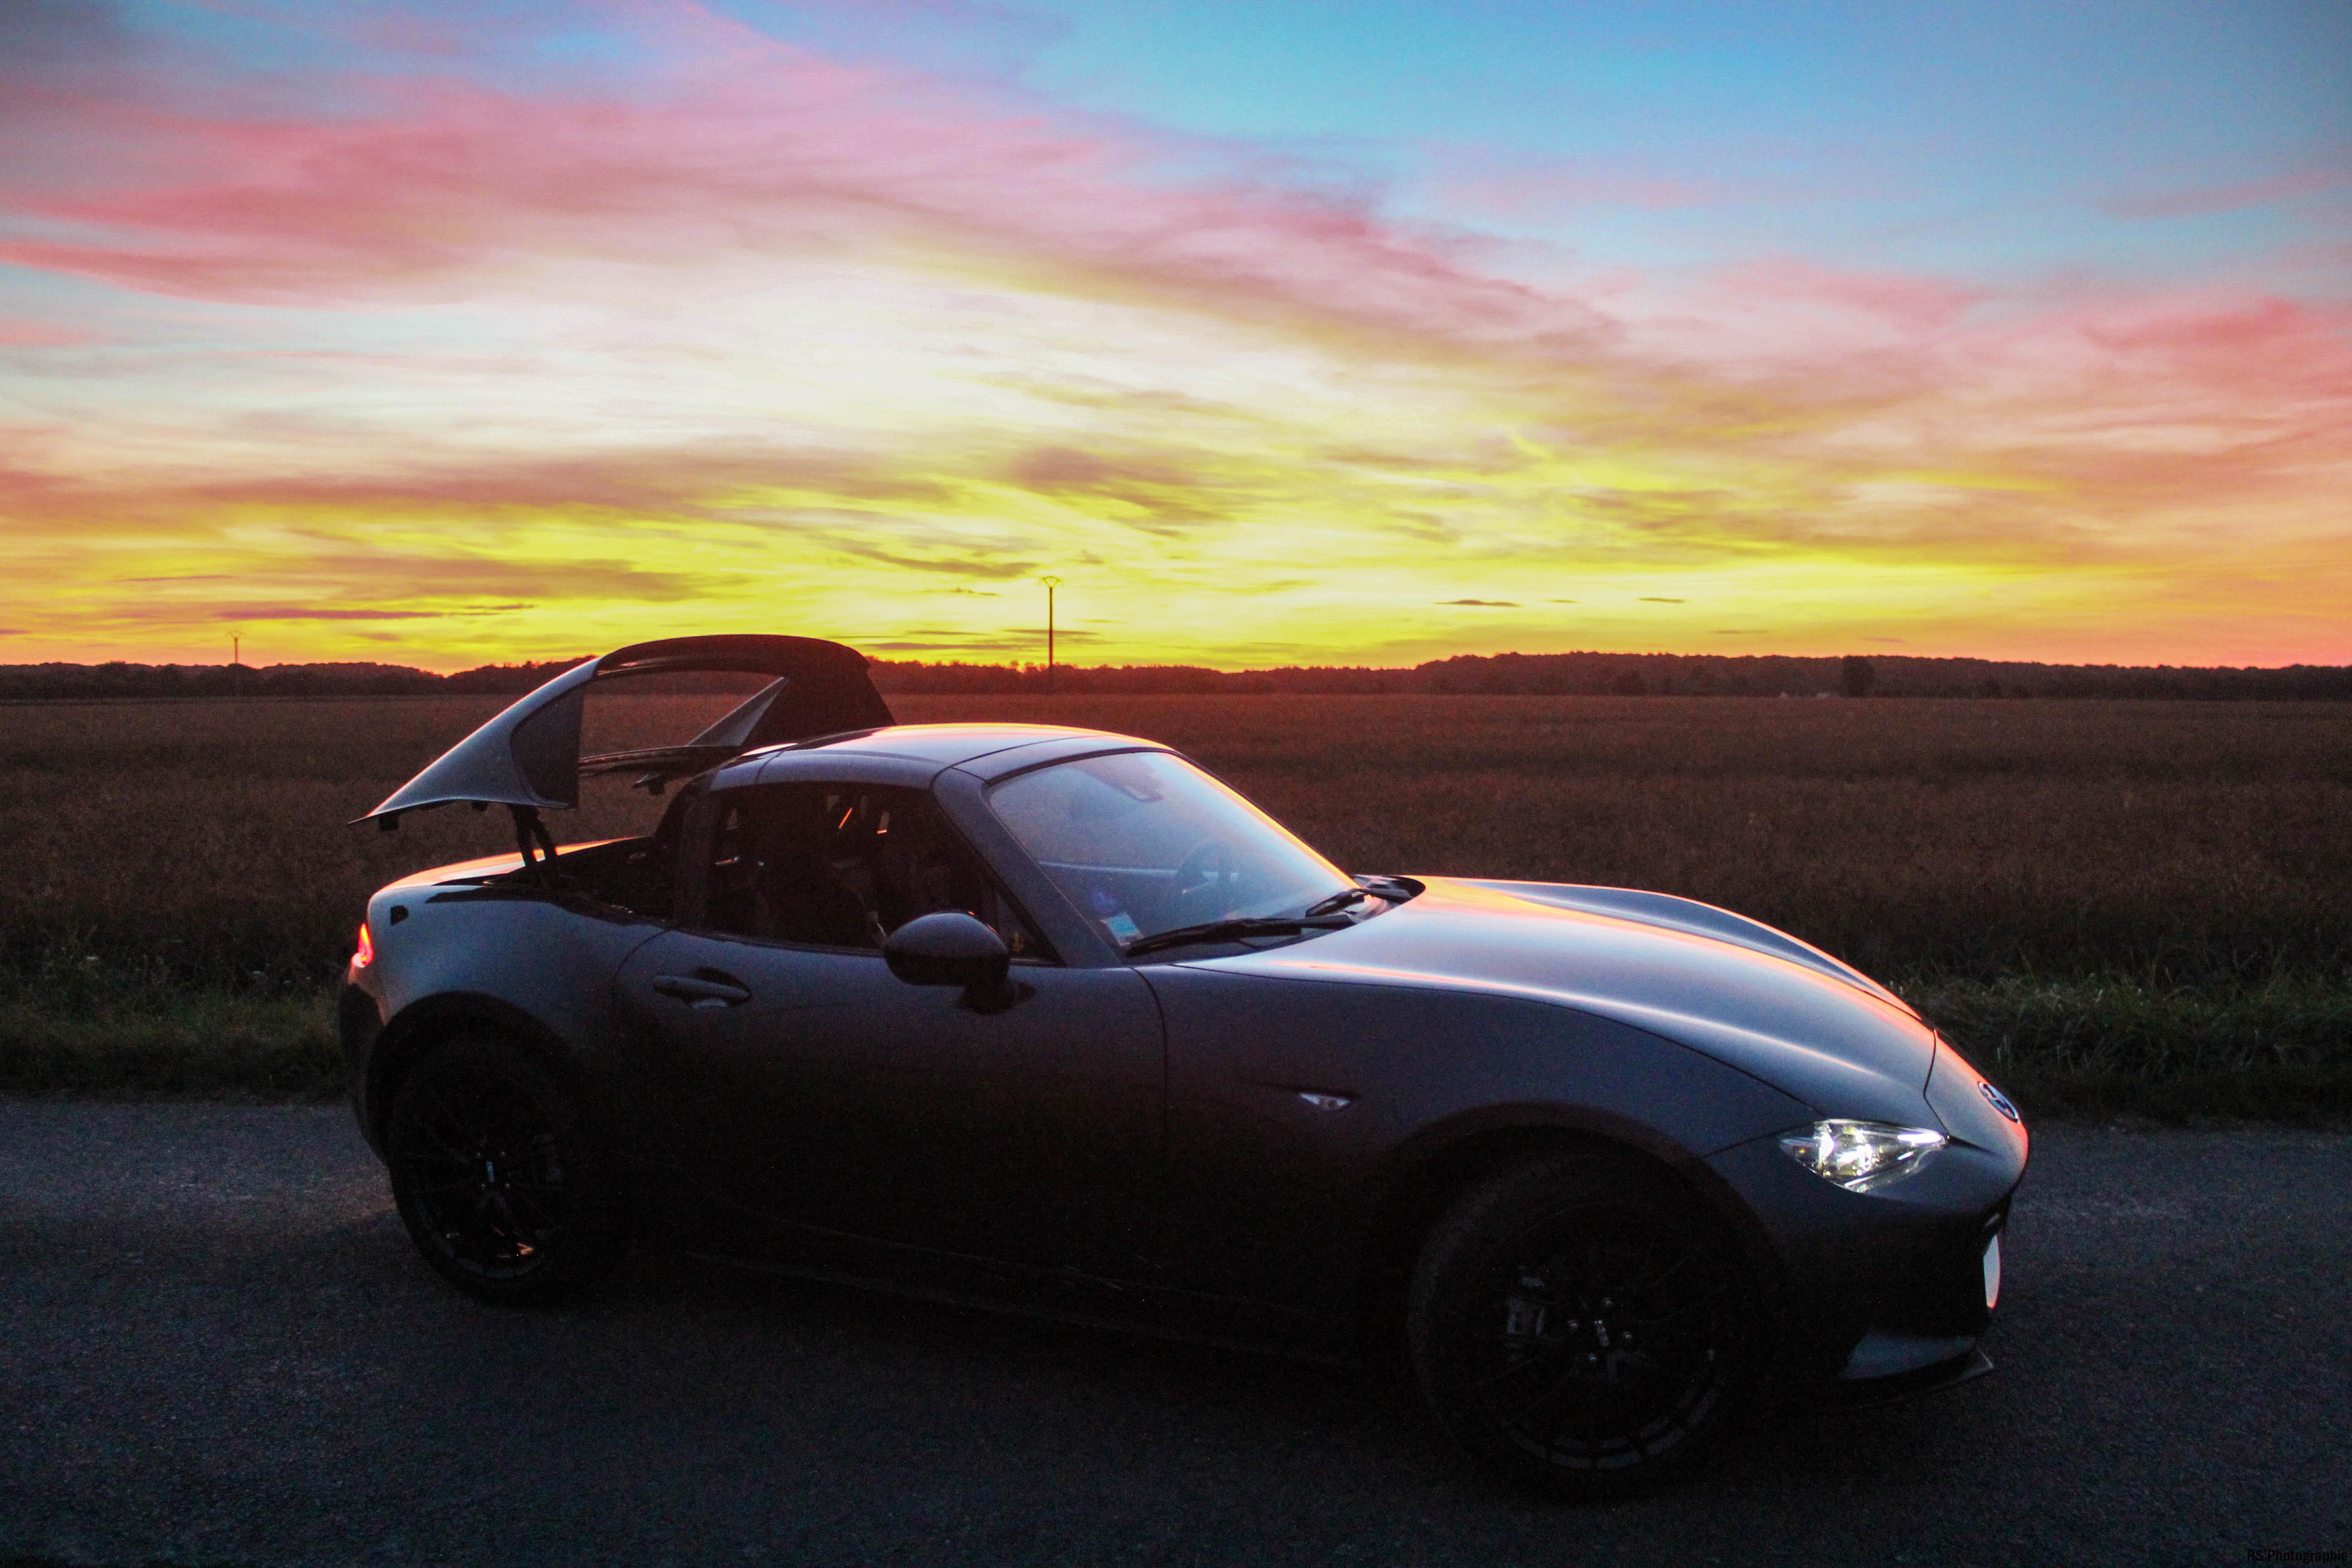 MazdaMX5RF32-mazda-mx5-rf-edition-profil-side-Arnaud Demasier-RSPhotographie